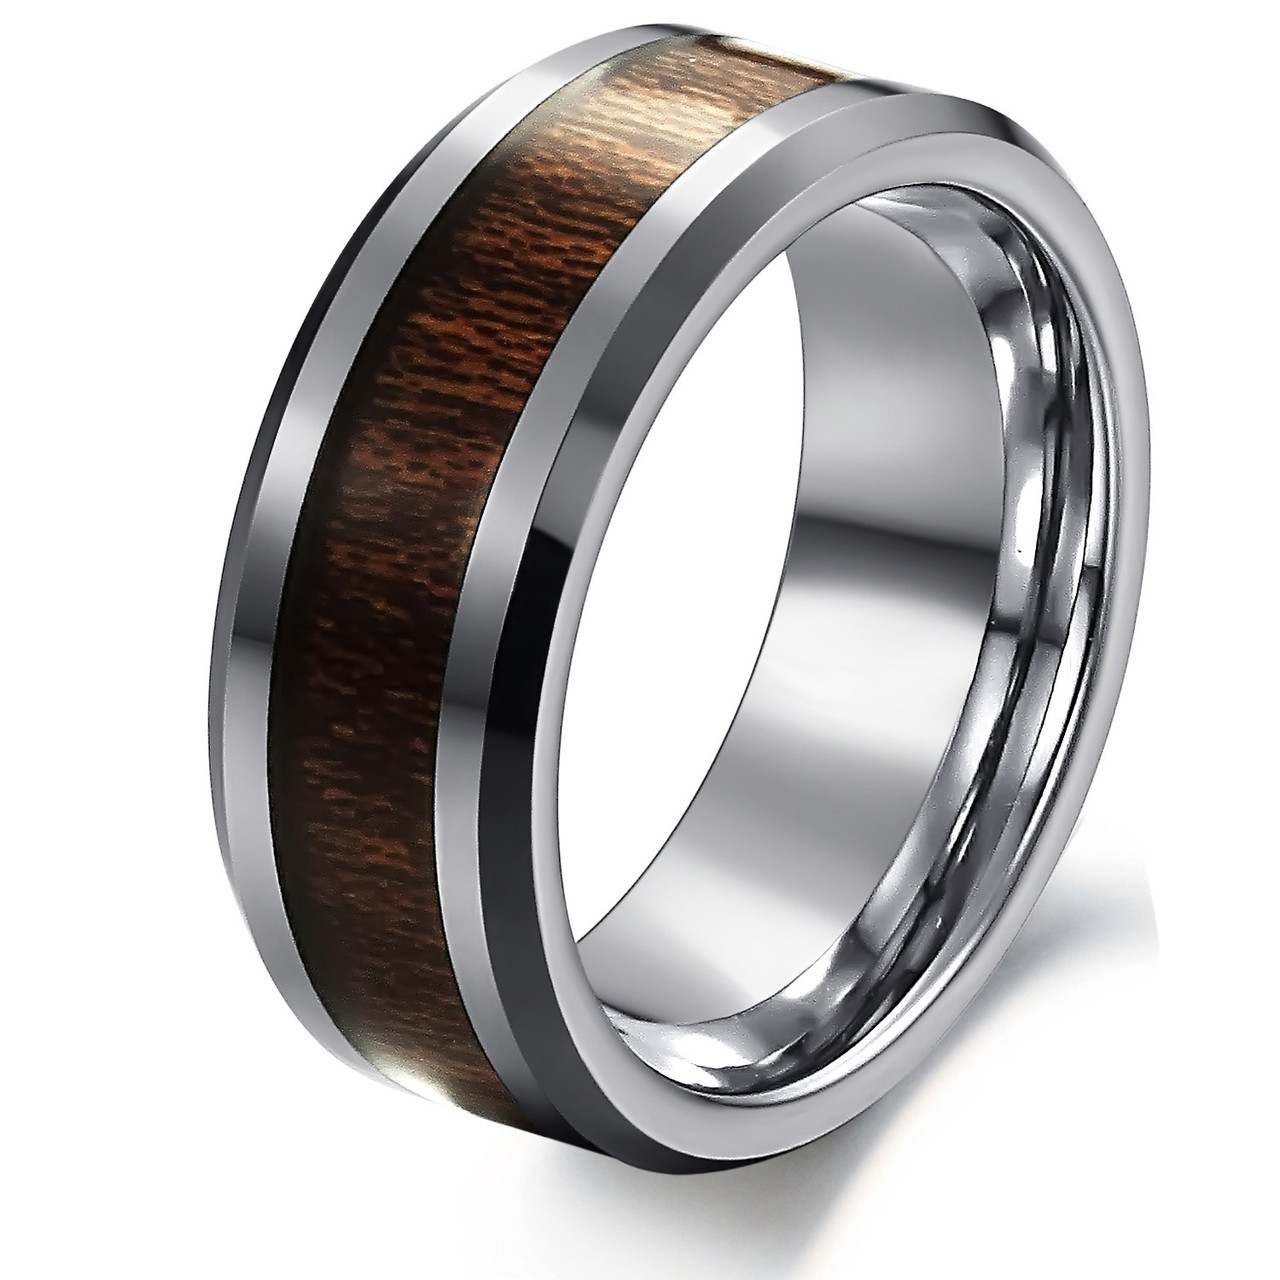 Мужское кольцо из карбида вольфрама и карбона, фото 1